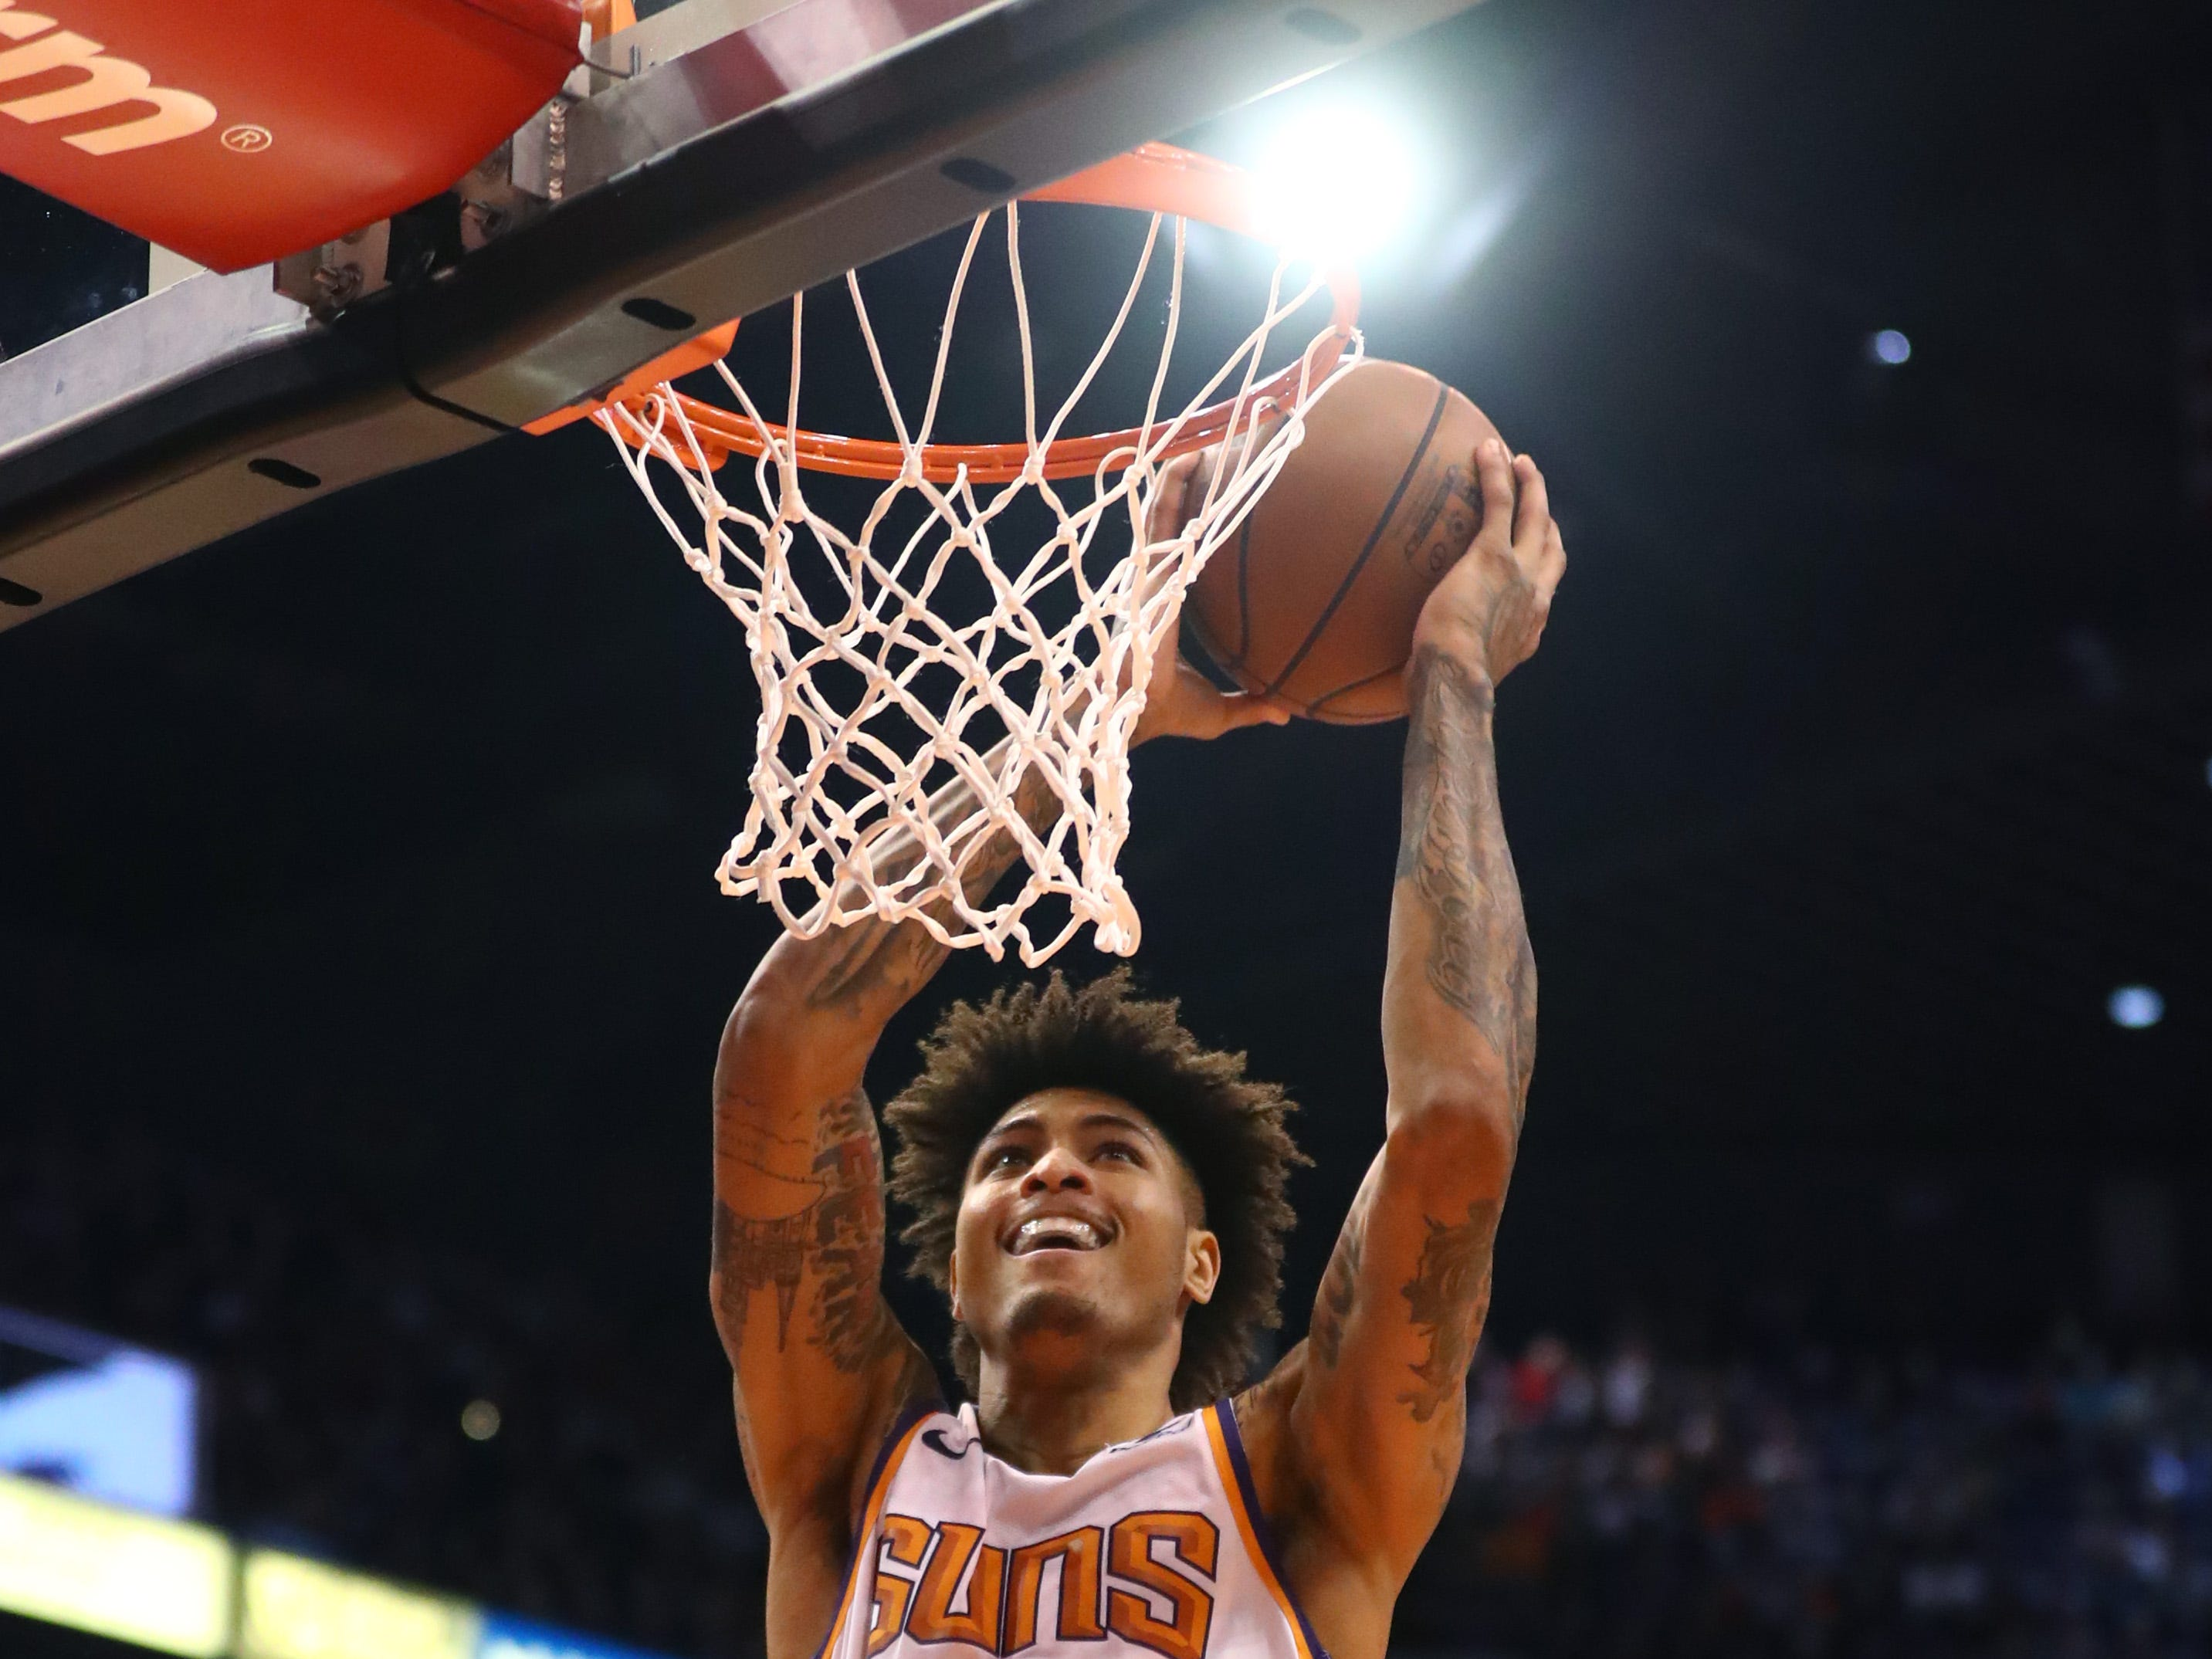 Jan 2, 2019; Phoenix, AZ, USA; Phoenix Suns forward Kelly Oubre Jr. (3) dunks the ball against the Philadelphia 76ers at Talking Stick Resort Arena. Mandatory Credit: Mark J. Rebilas-USA TODAY Sports